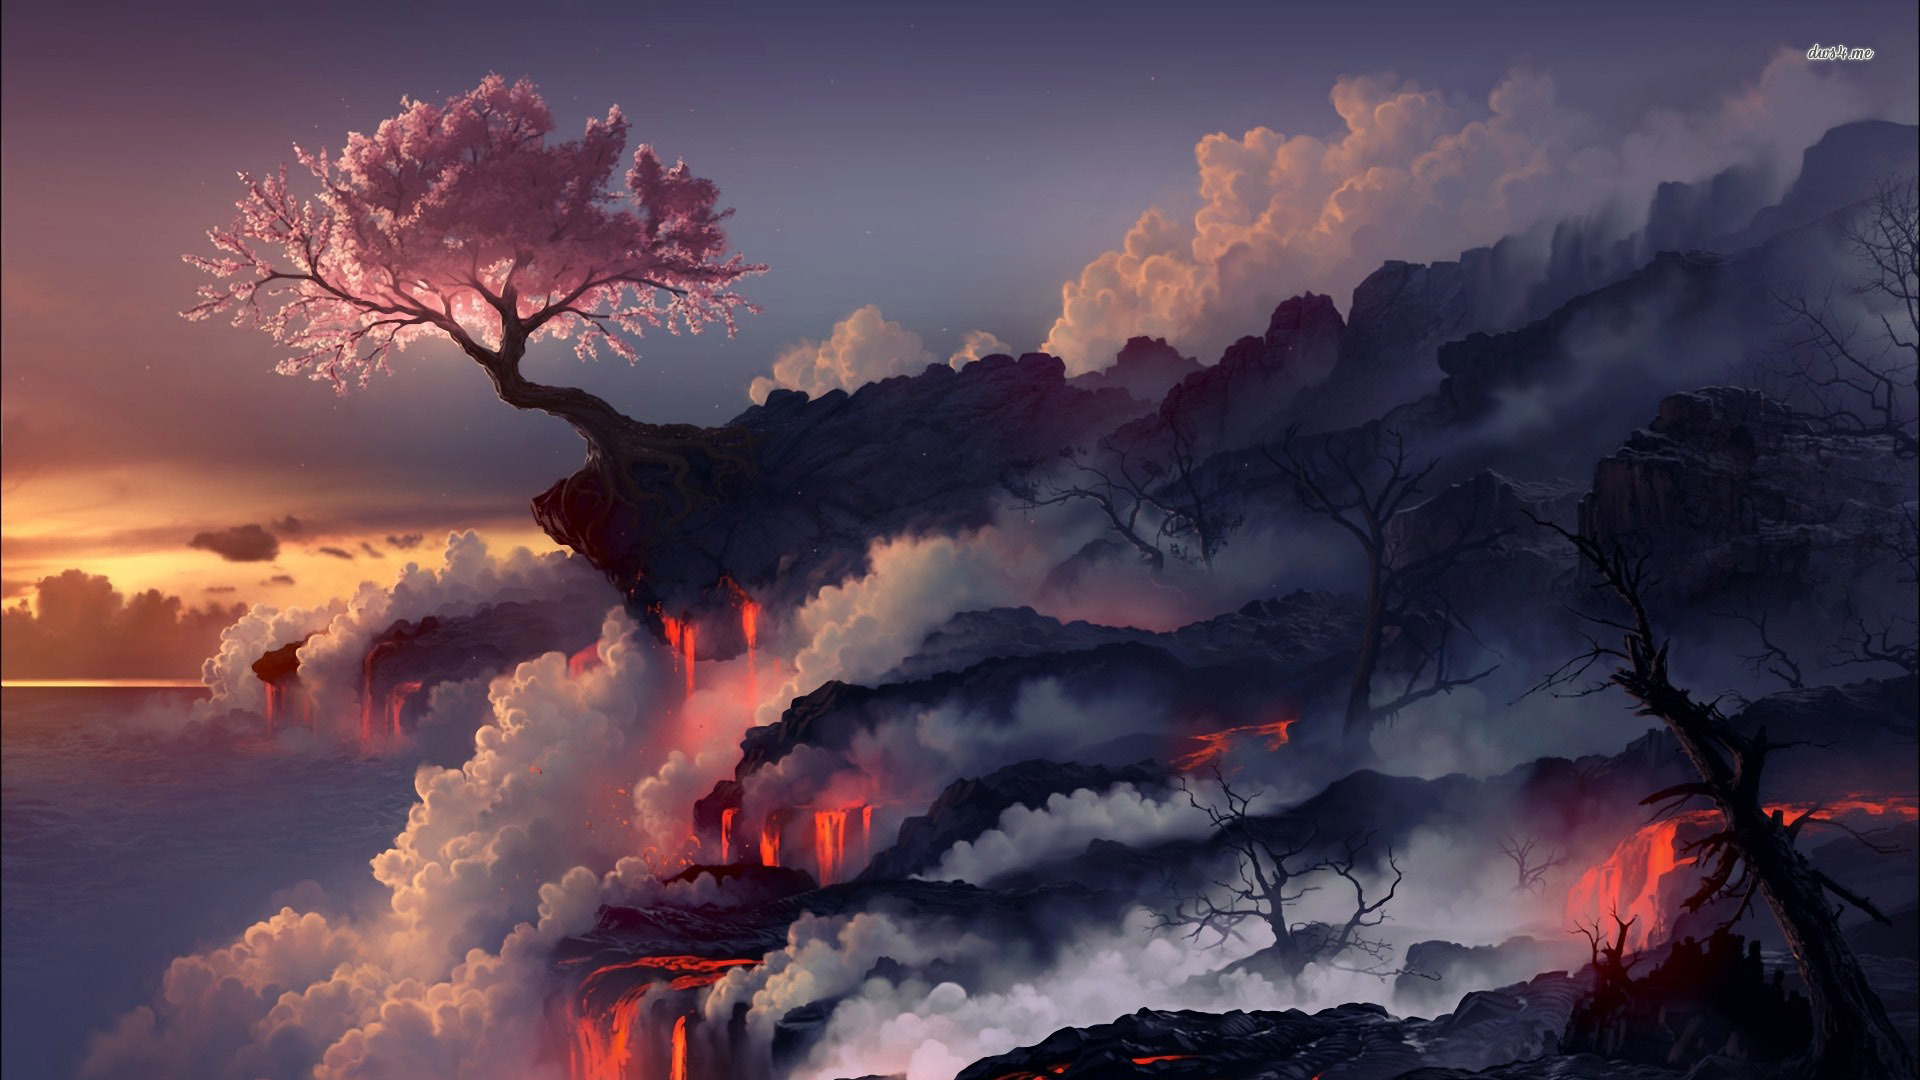 Volcano Wallpapers 4K 1920x1080   4USkY 1920x1080